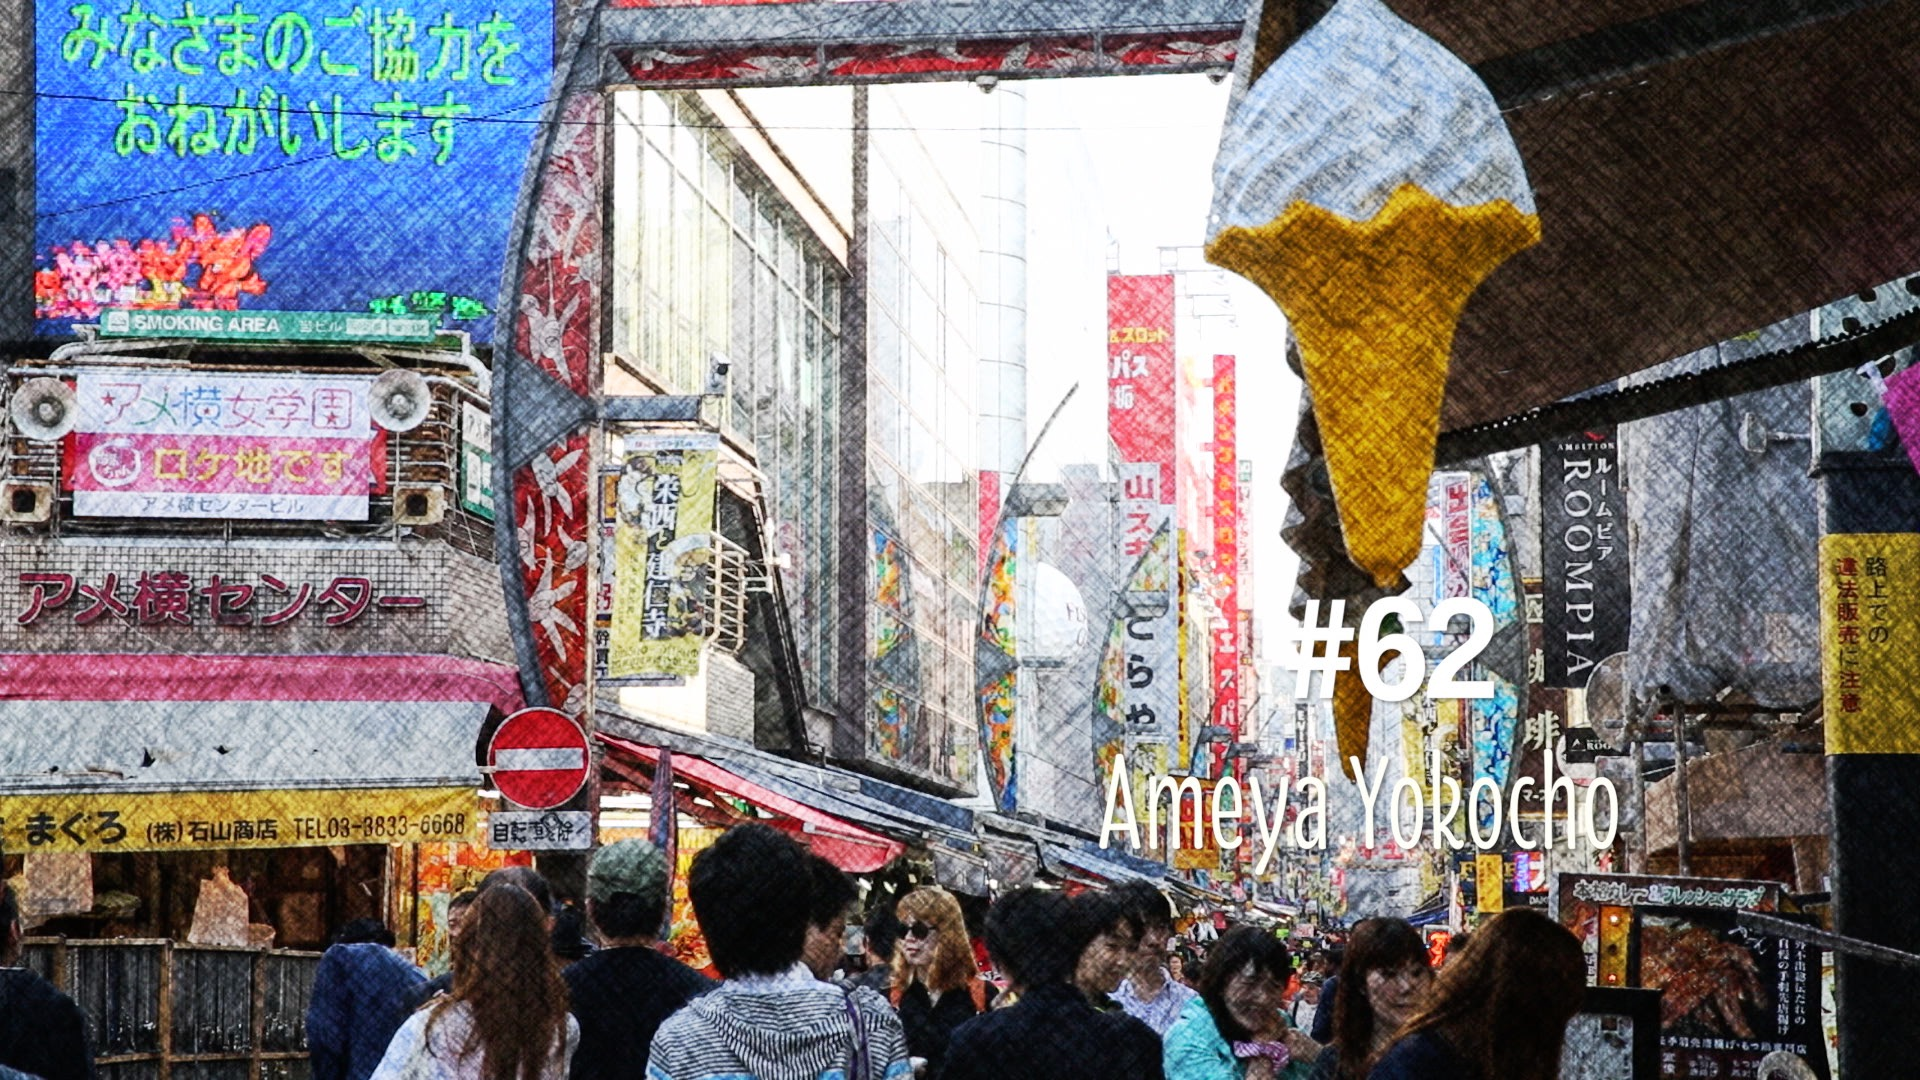 Le marché de Ameya Yokocho à Ueno (#62)